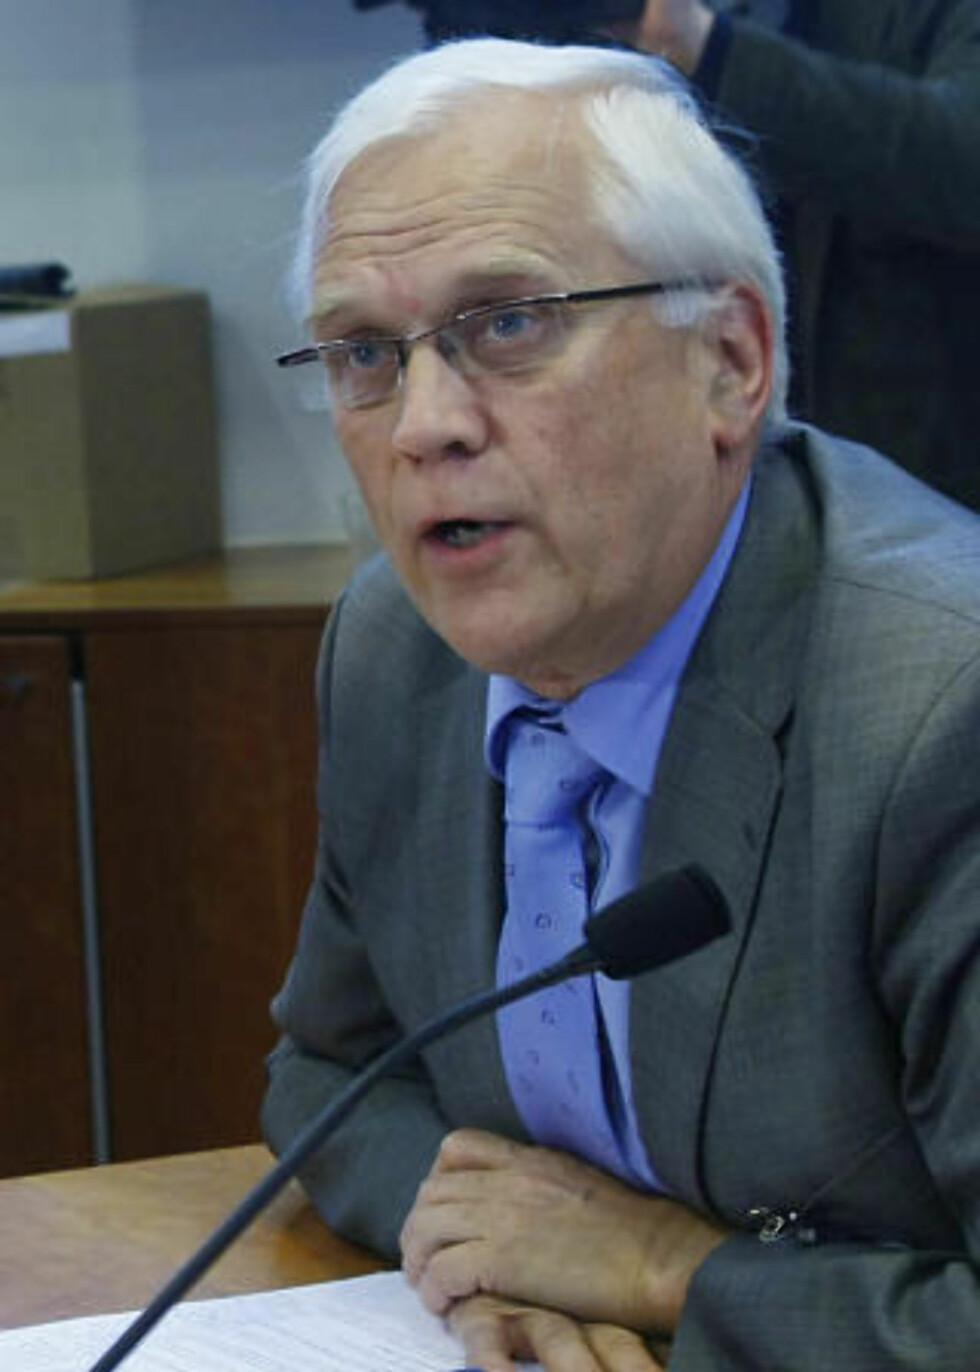 FORSVARER SEMINARET: Rektor ved NTNU, Torbjørn Digernes støtter seminaret og understreker at han ikke ønsker akademisk boikott av Israel. Foto: Heiko Junge / SCANPIX .